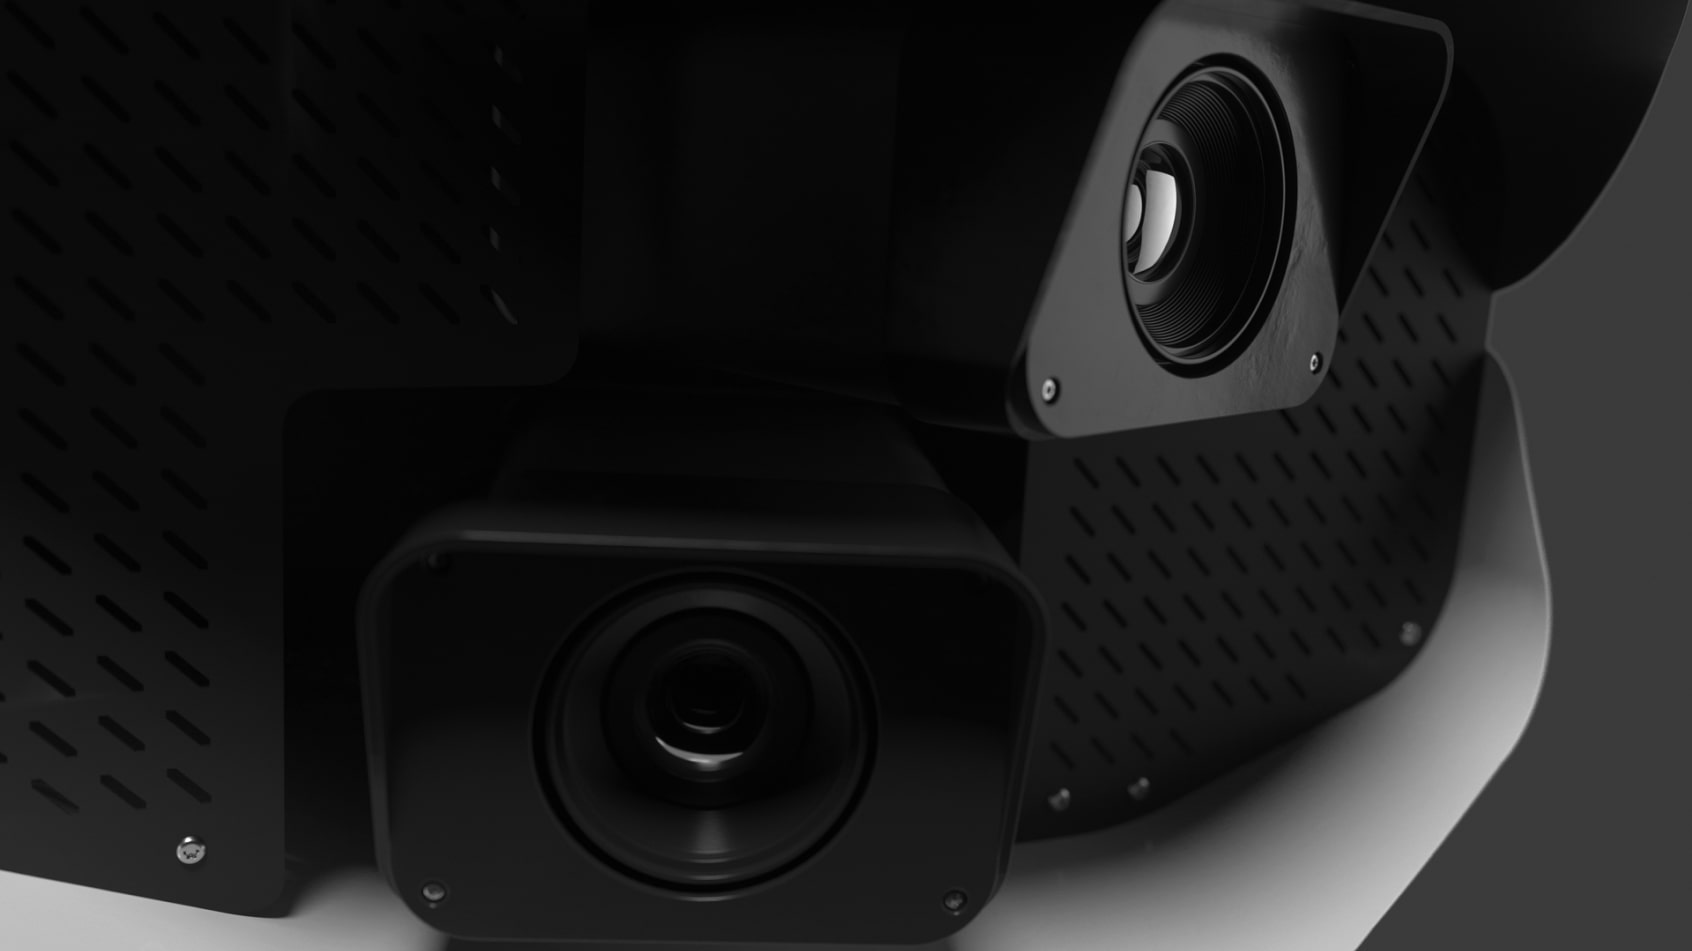 The Asport Camera System